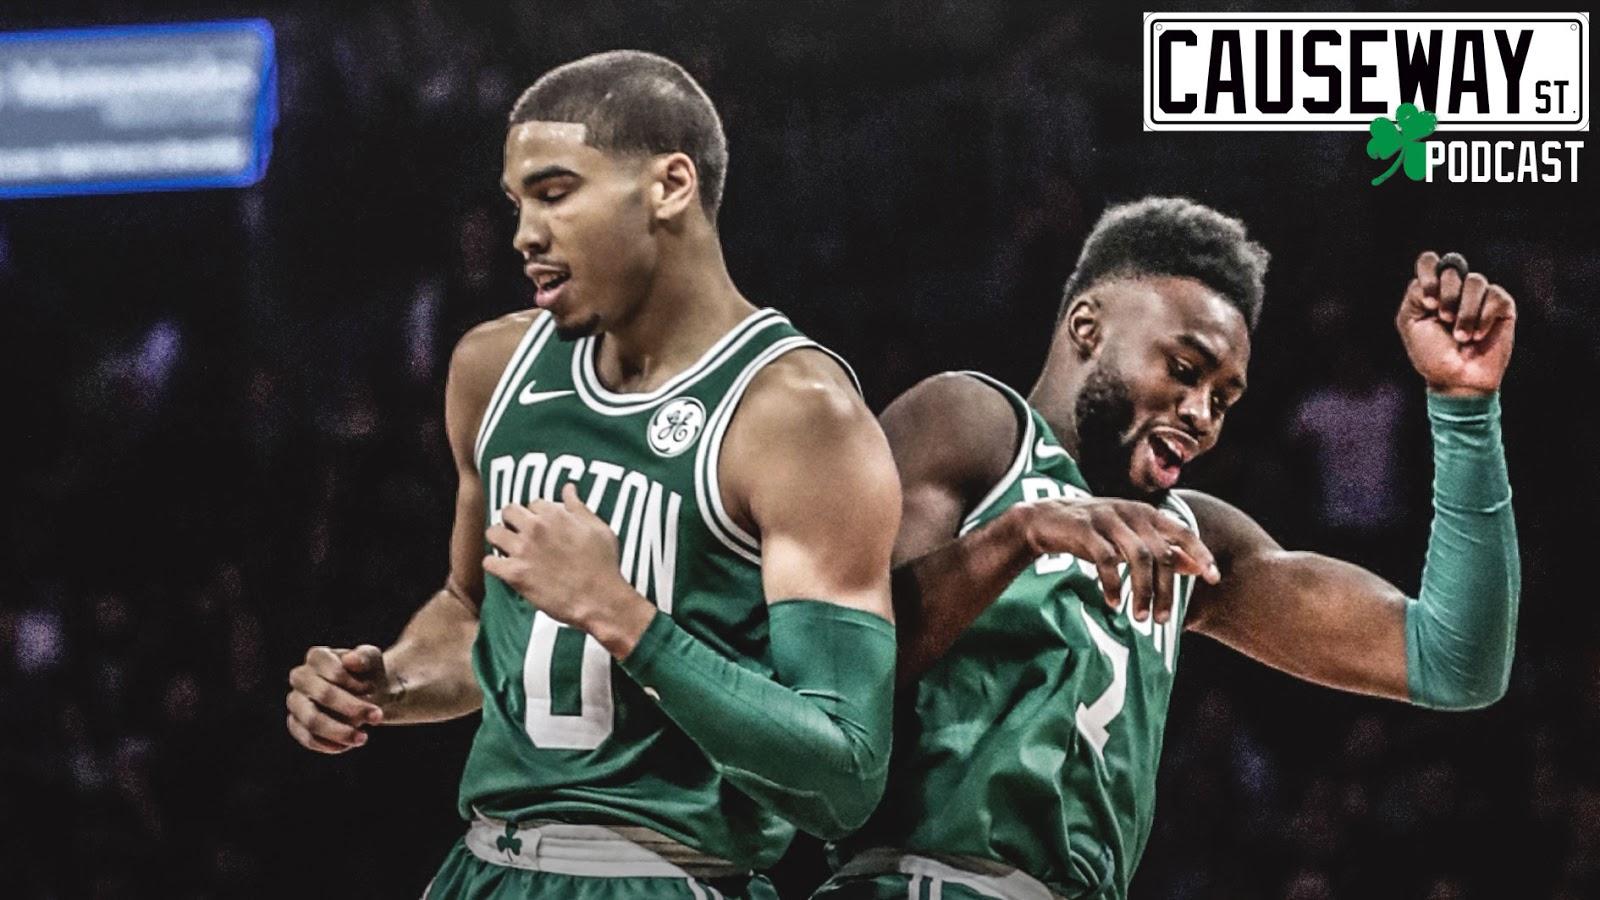 Causeway Street Causeway Street Podcast Jayson Tatum Jaylen Brown Era For Celtics